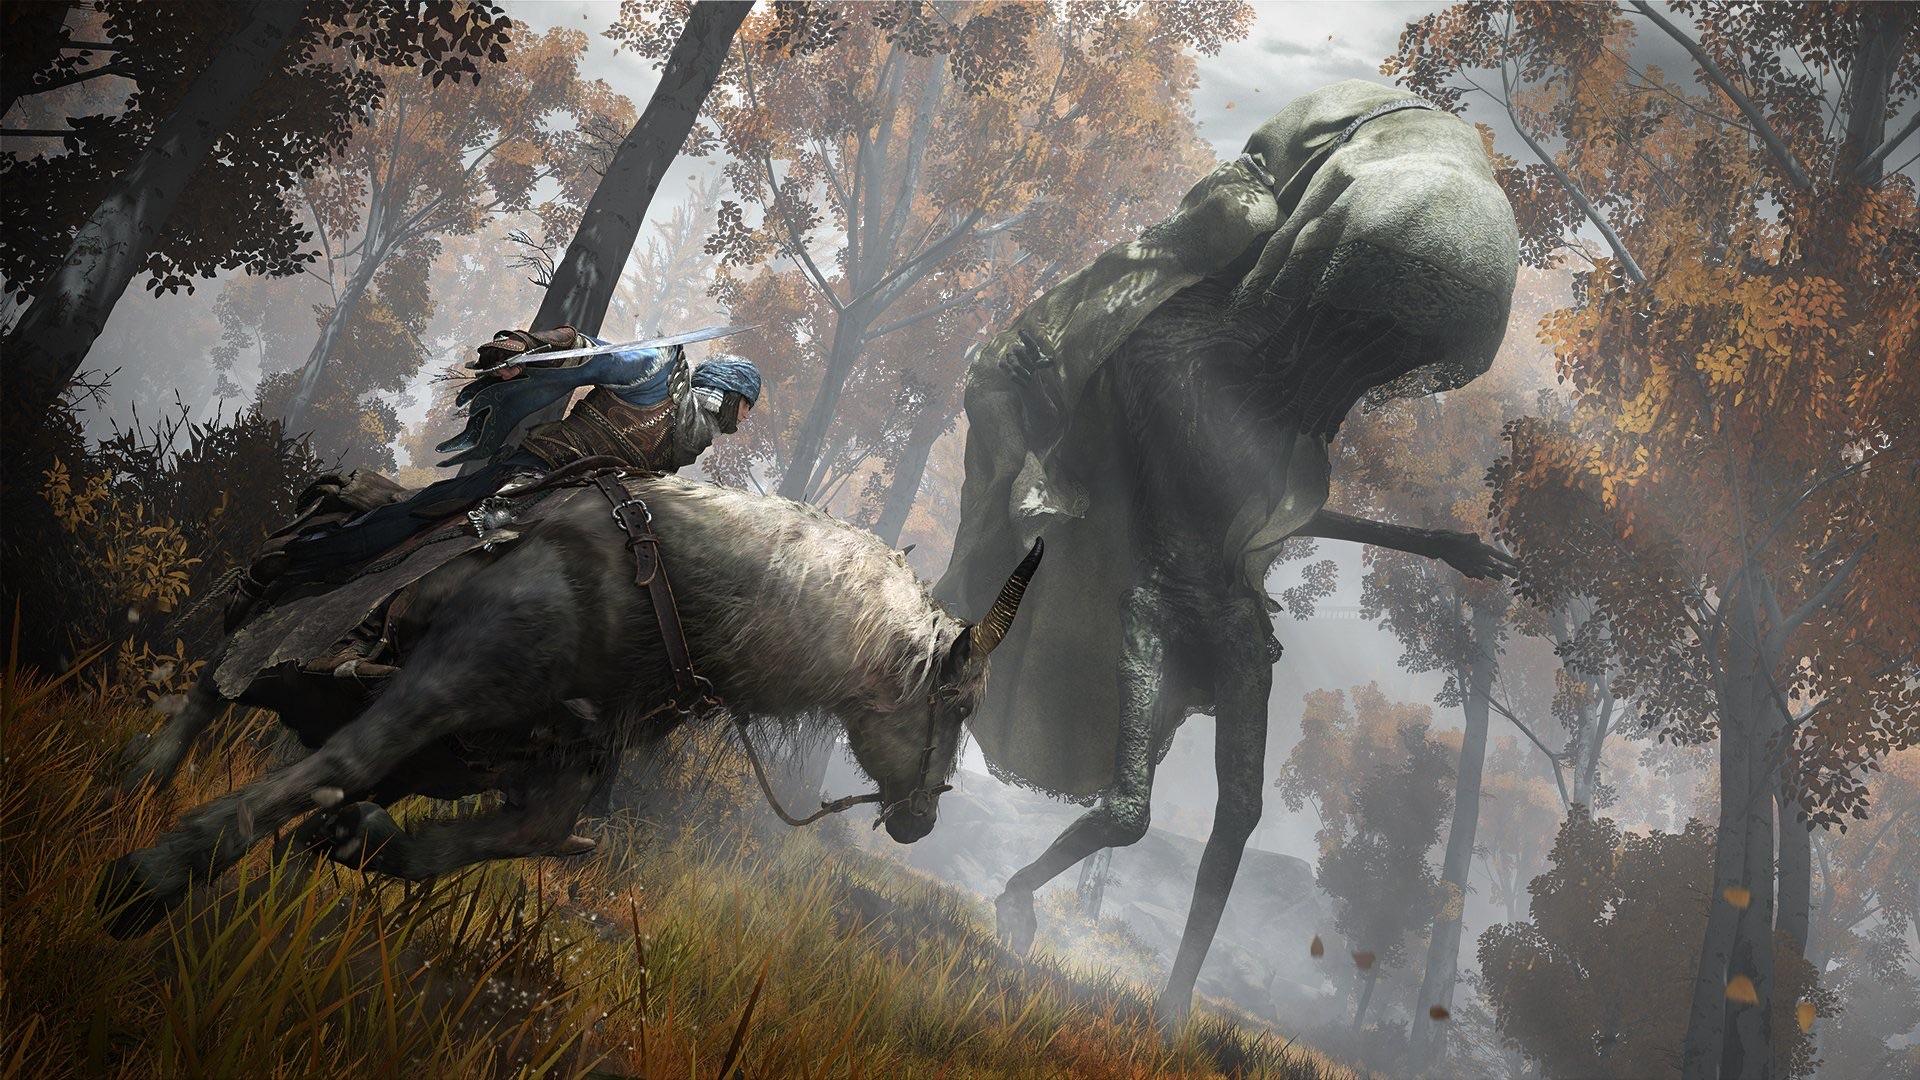 Le jeu Elden Ring (George R.R. Martin) ne sera « pas aussi difficile » que la trilogie Dark Souls